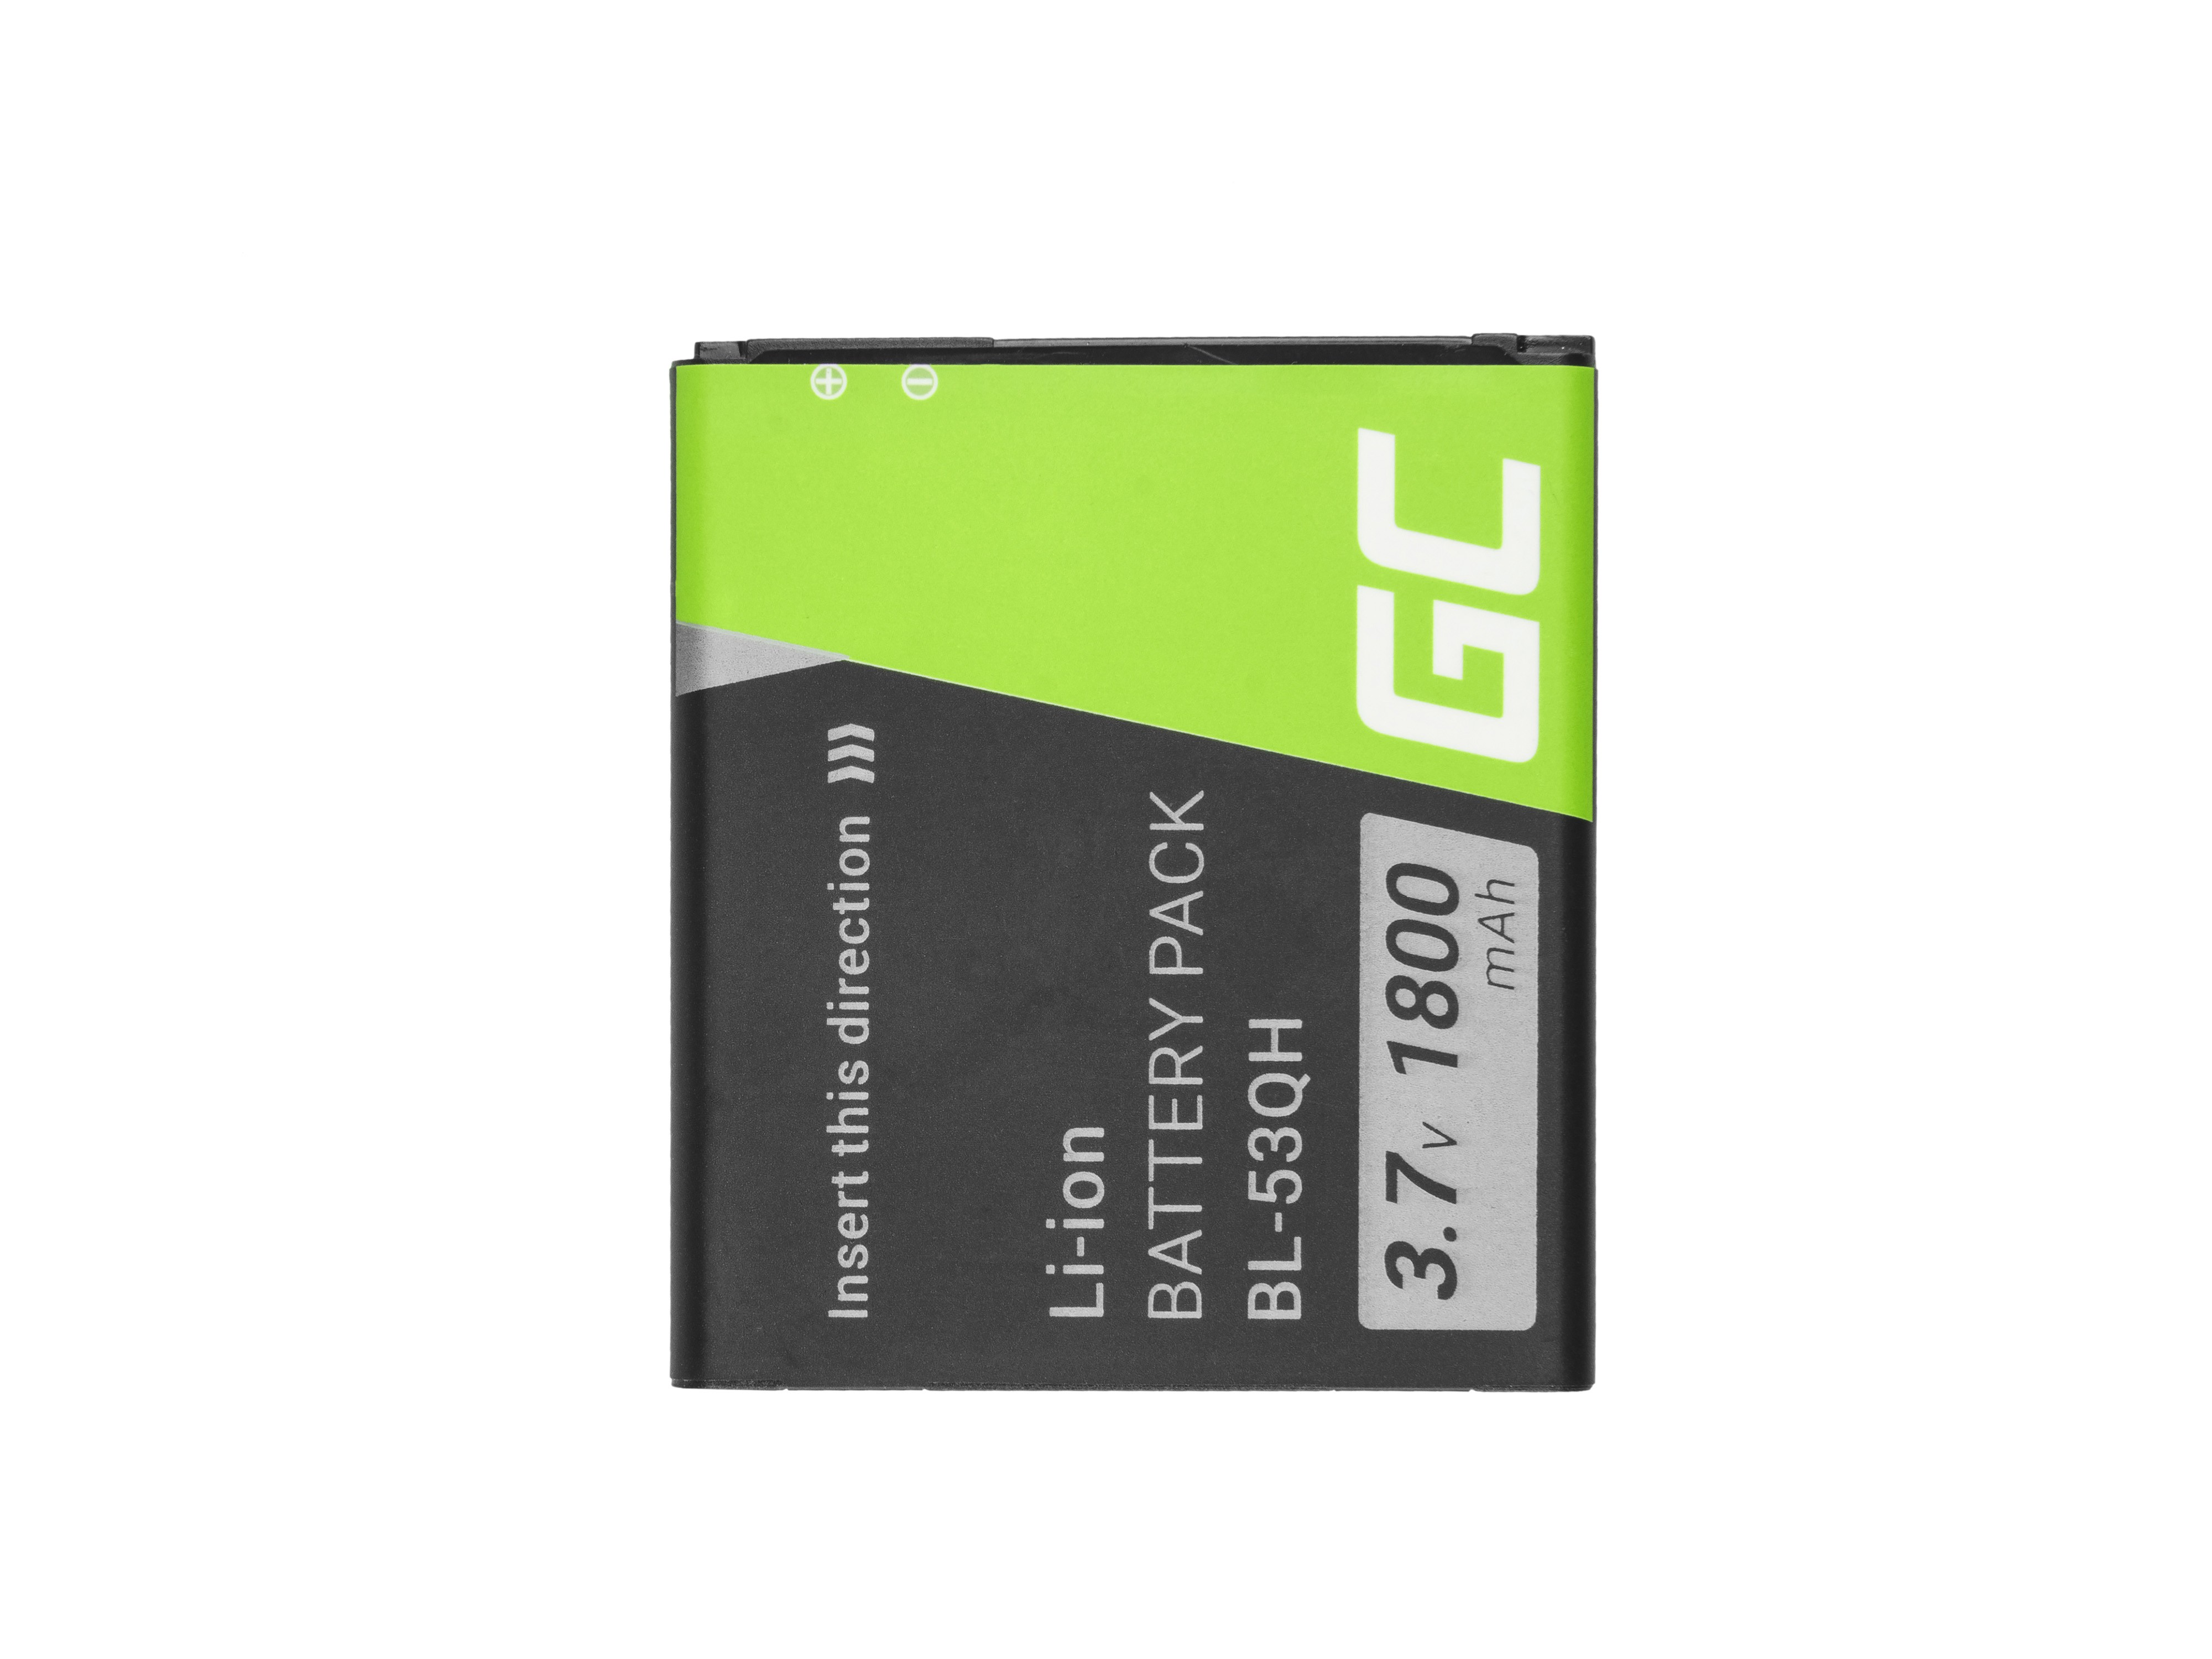 Green Cell smartphone batteri BL-53QH för LG L9 P760 P769 P880 P880G 4X HD